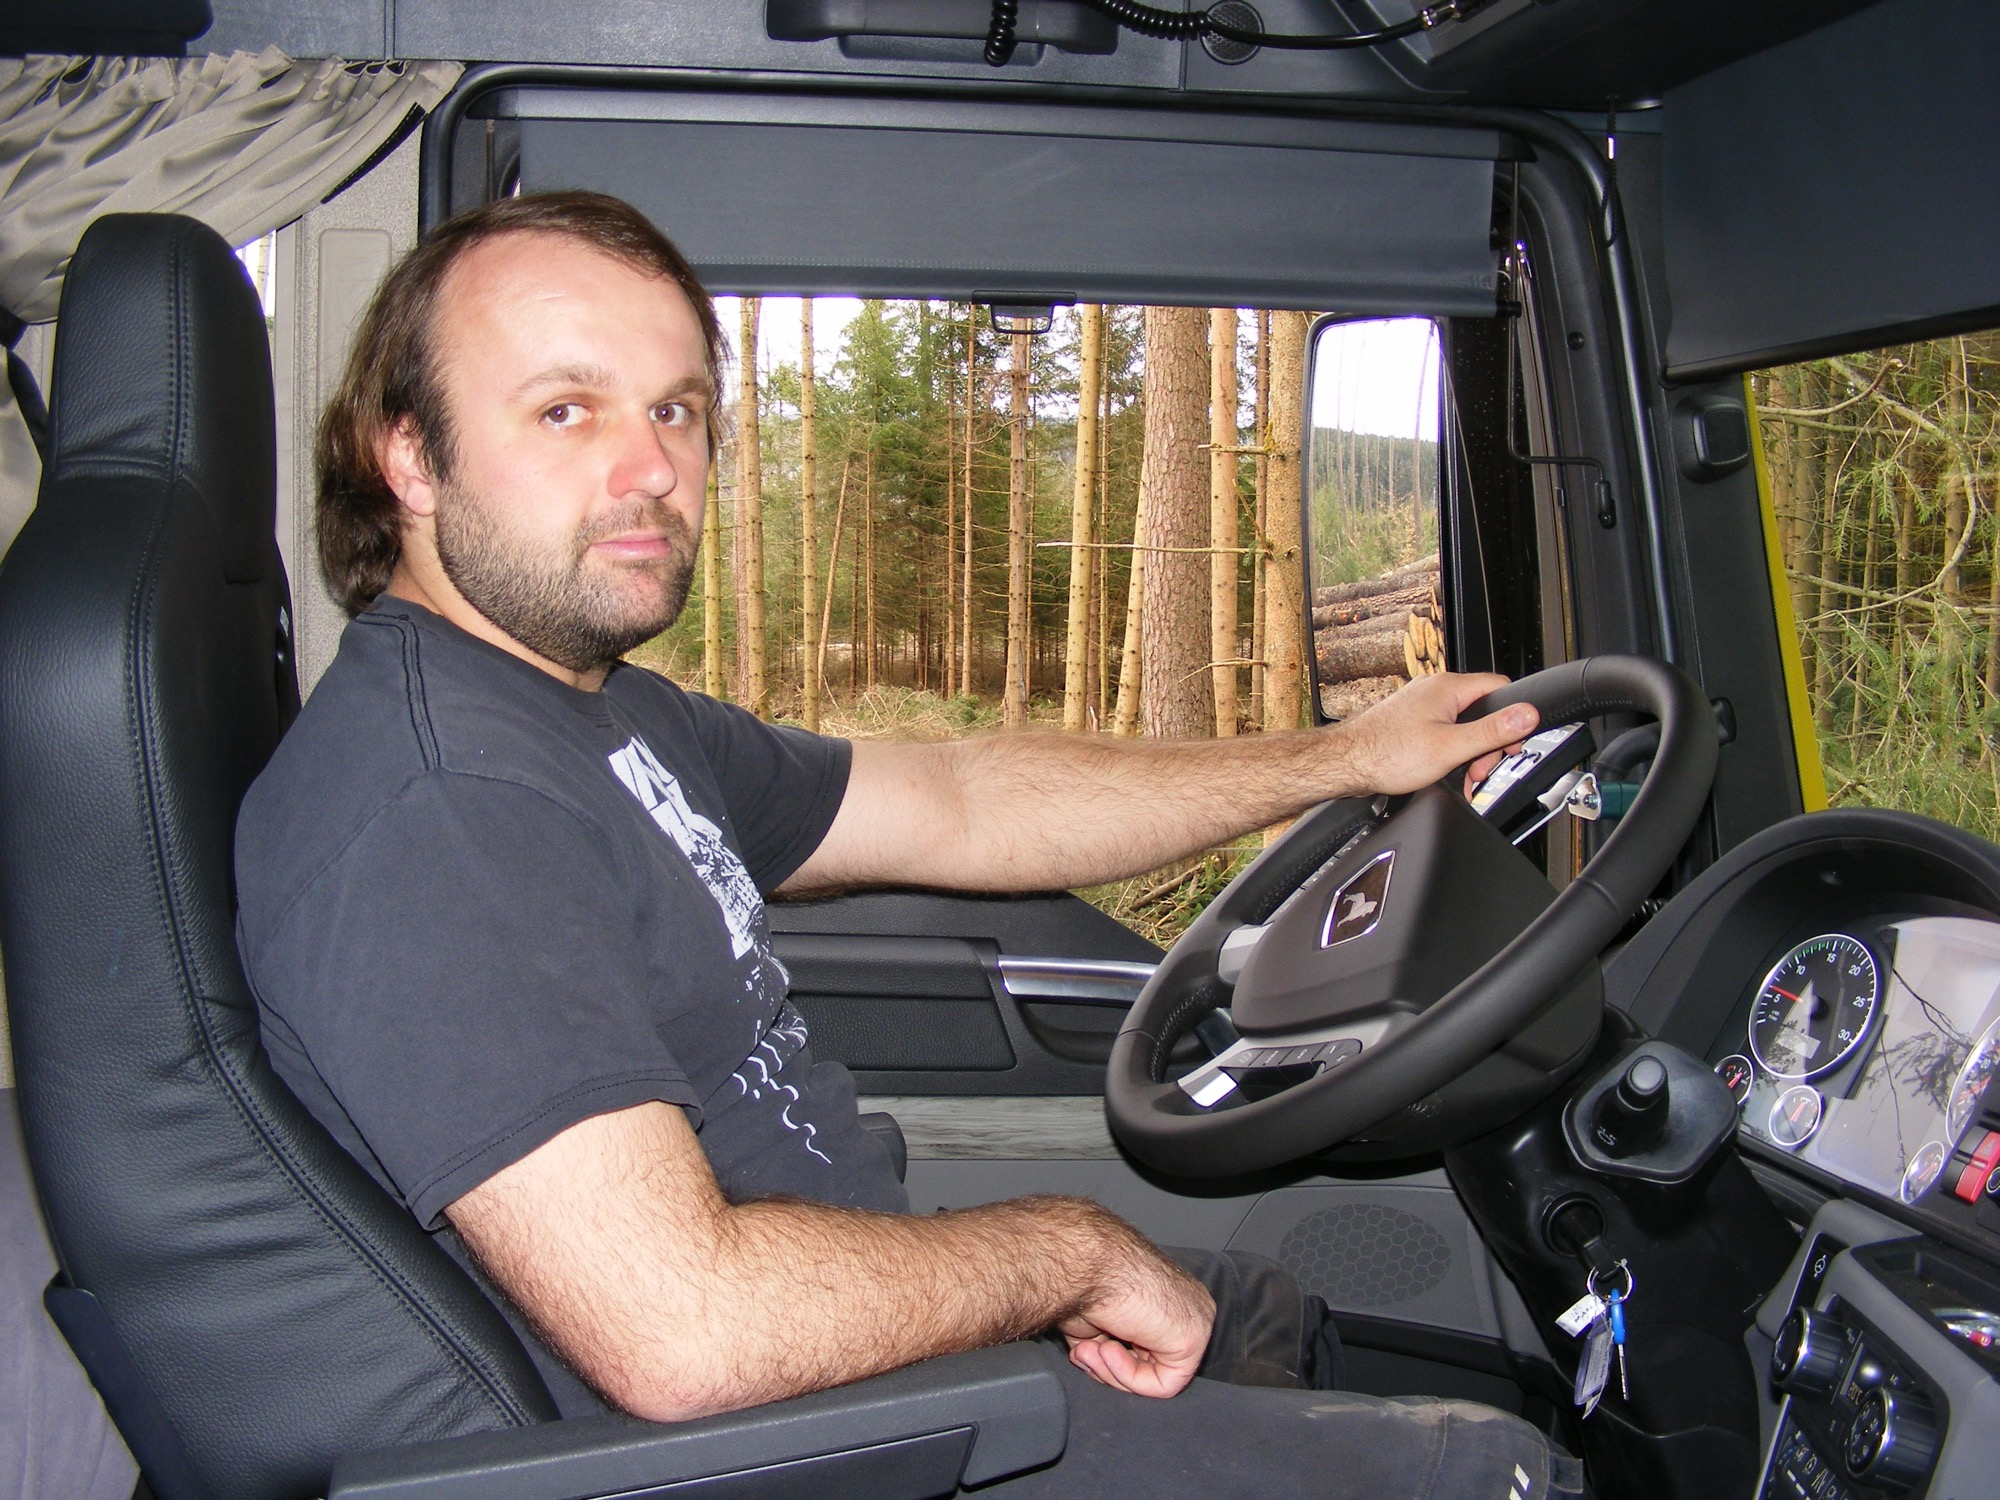 2020-5-8-Oppenau-Ilse und Manfred Oestreich-Holztransport-Nagel 200314u